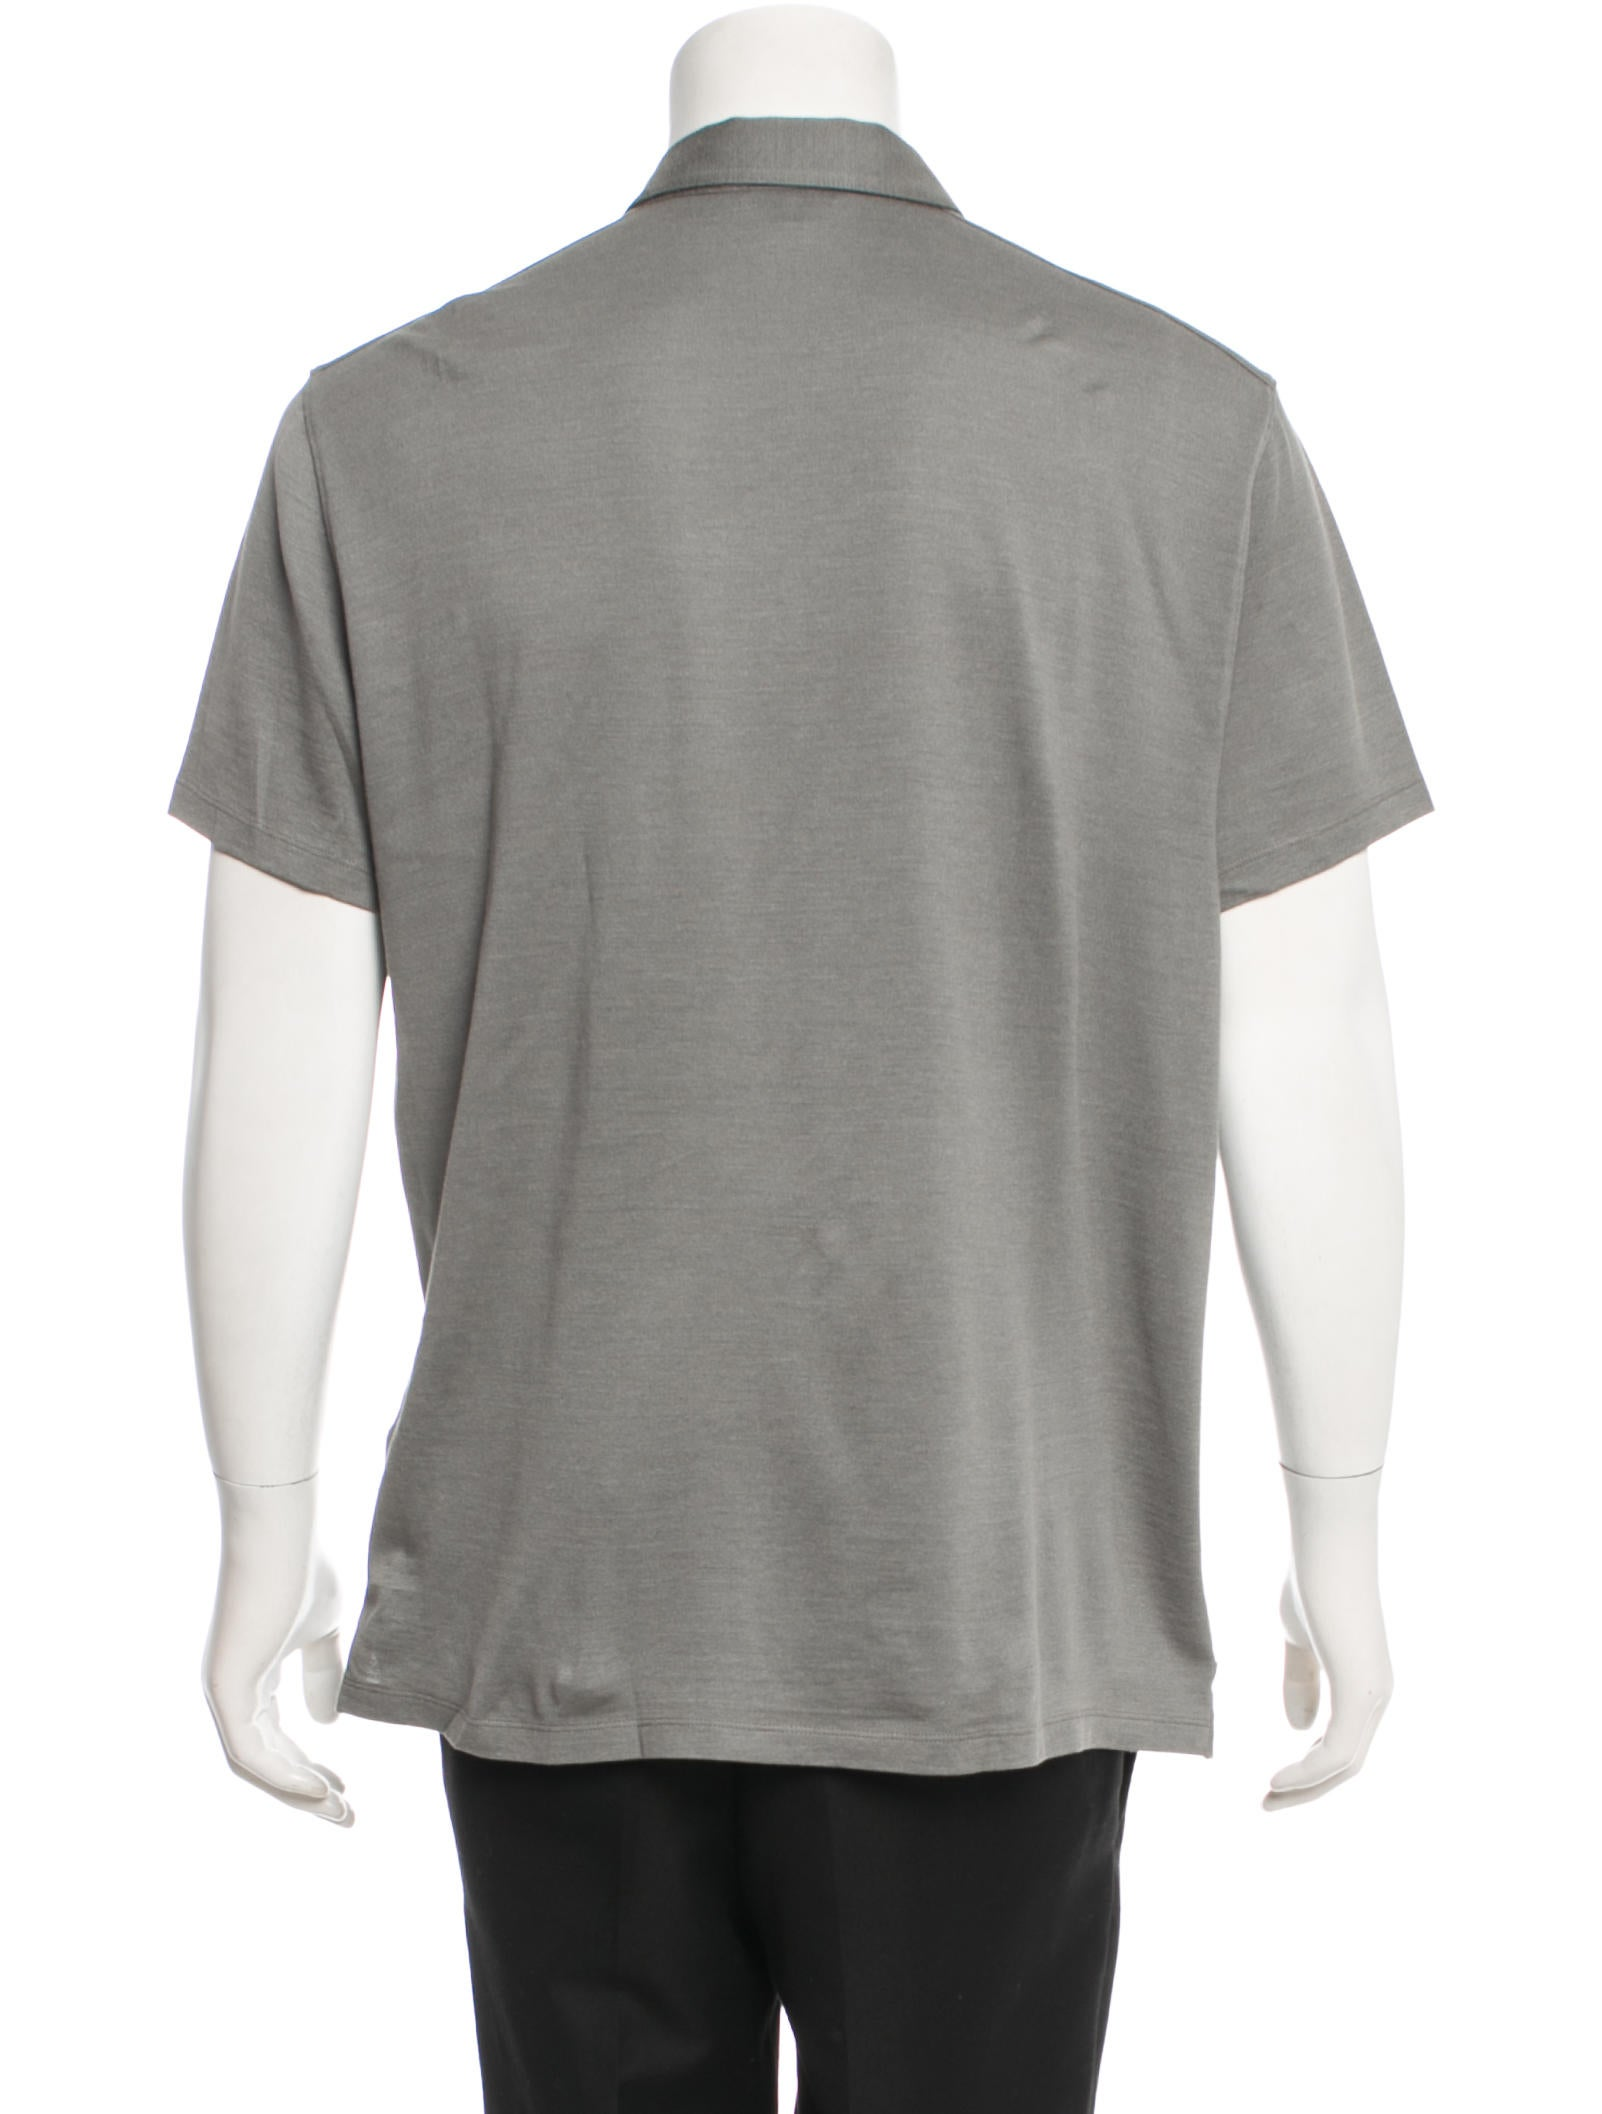 John Varvatos Silk Polo Shirt Clothing Jva21352 The